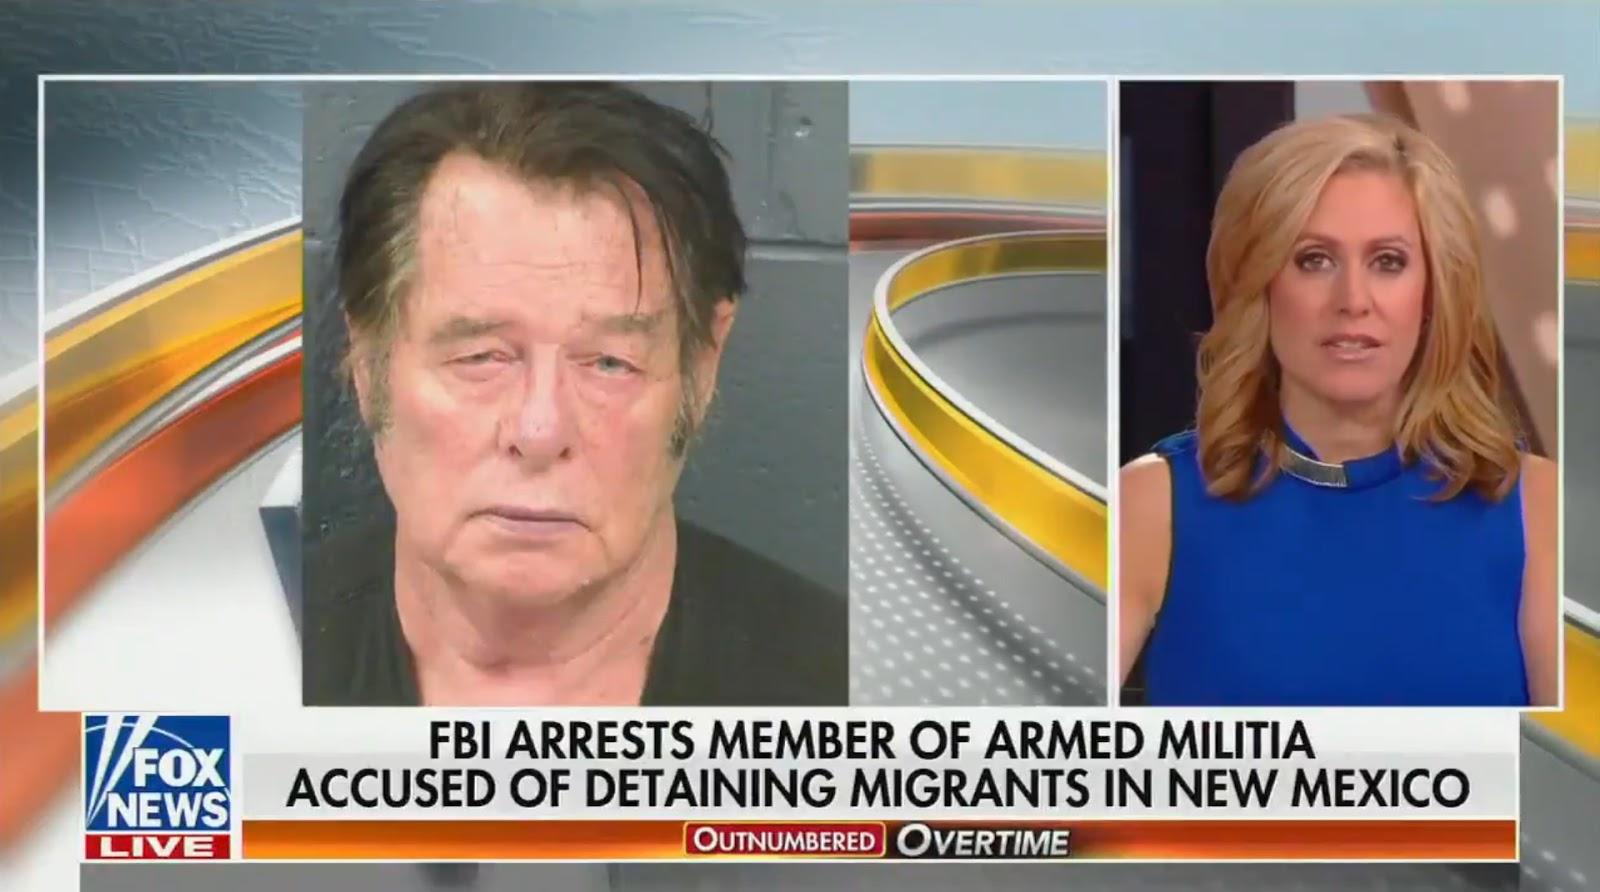 Violette\'s Page: Fox News gives credence to a nativist vigilante ...